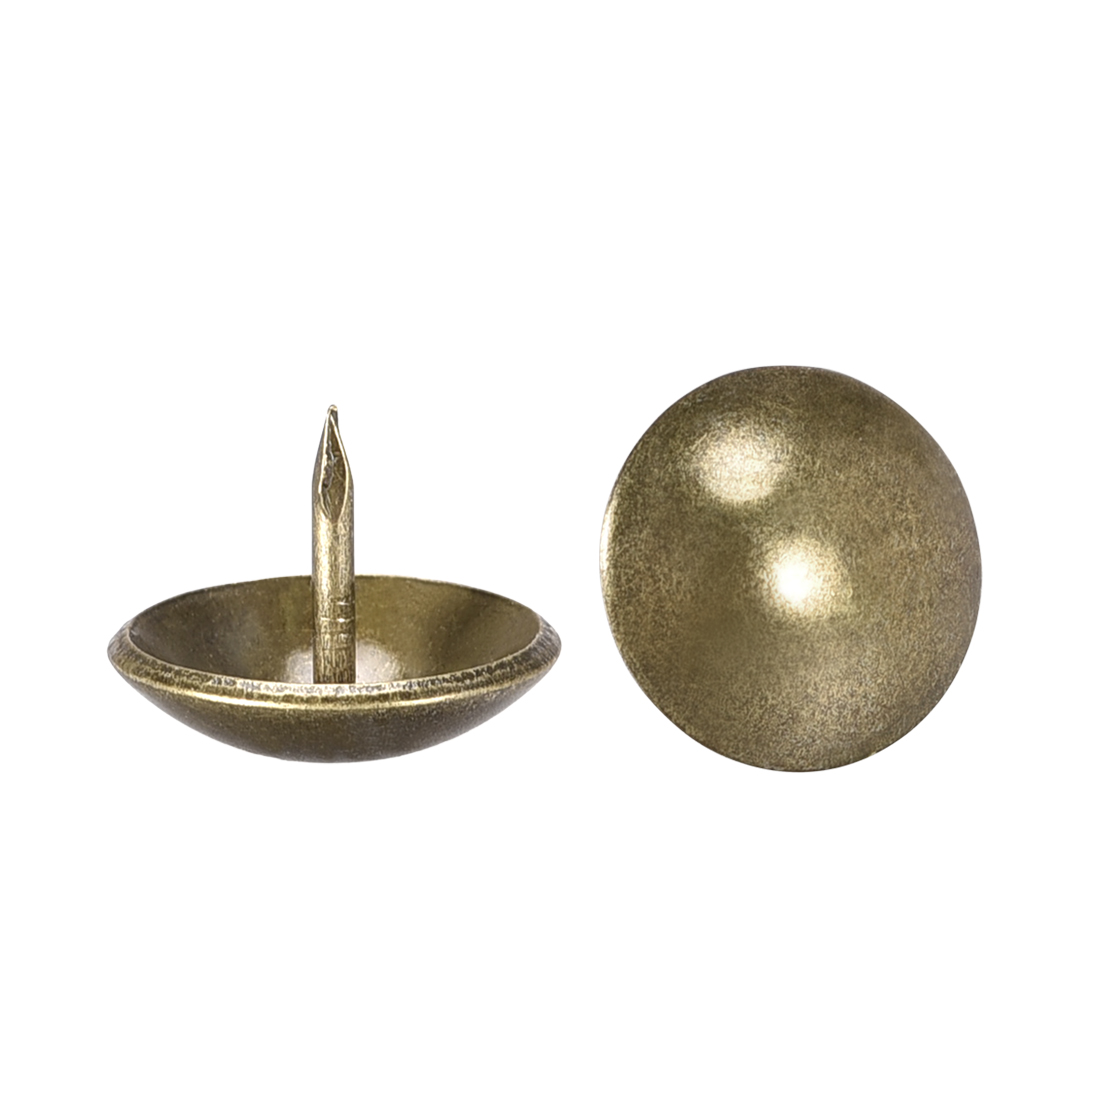 Upholstery Nails Tacks 19mm Dia 15mm Height Round Push Pins Bronze Tone 100 Pcs